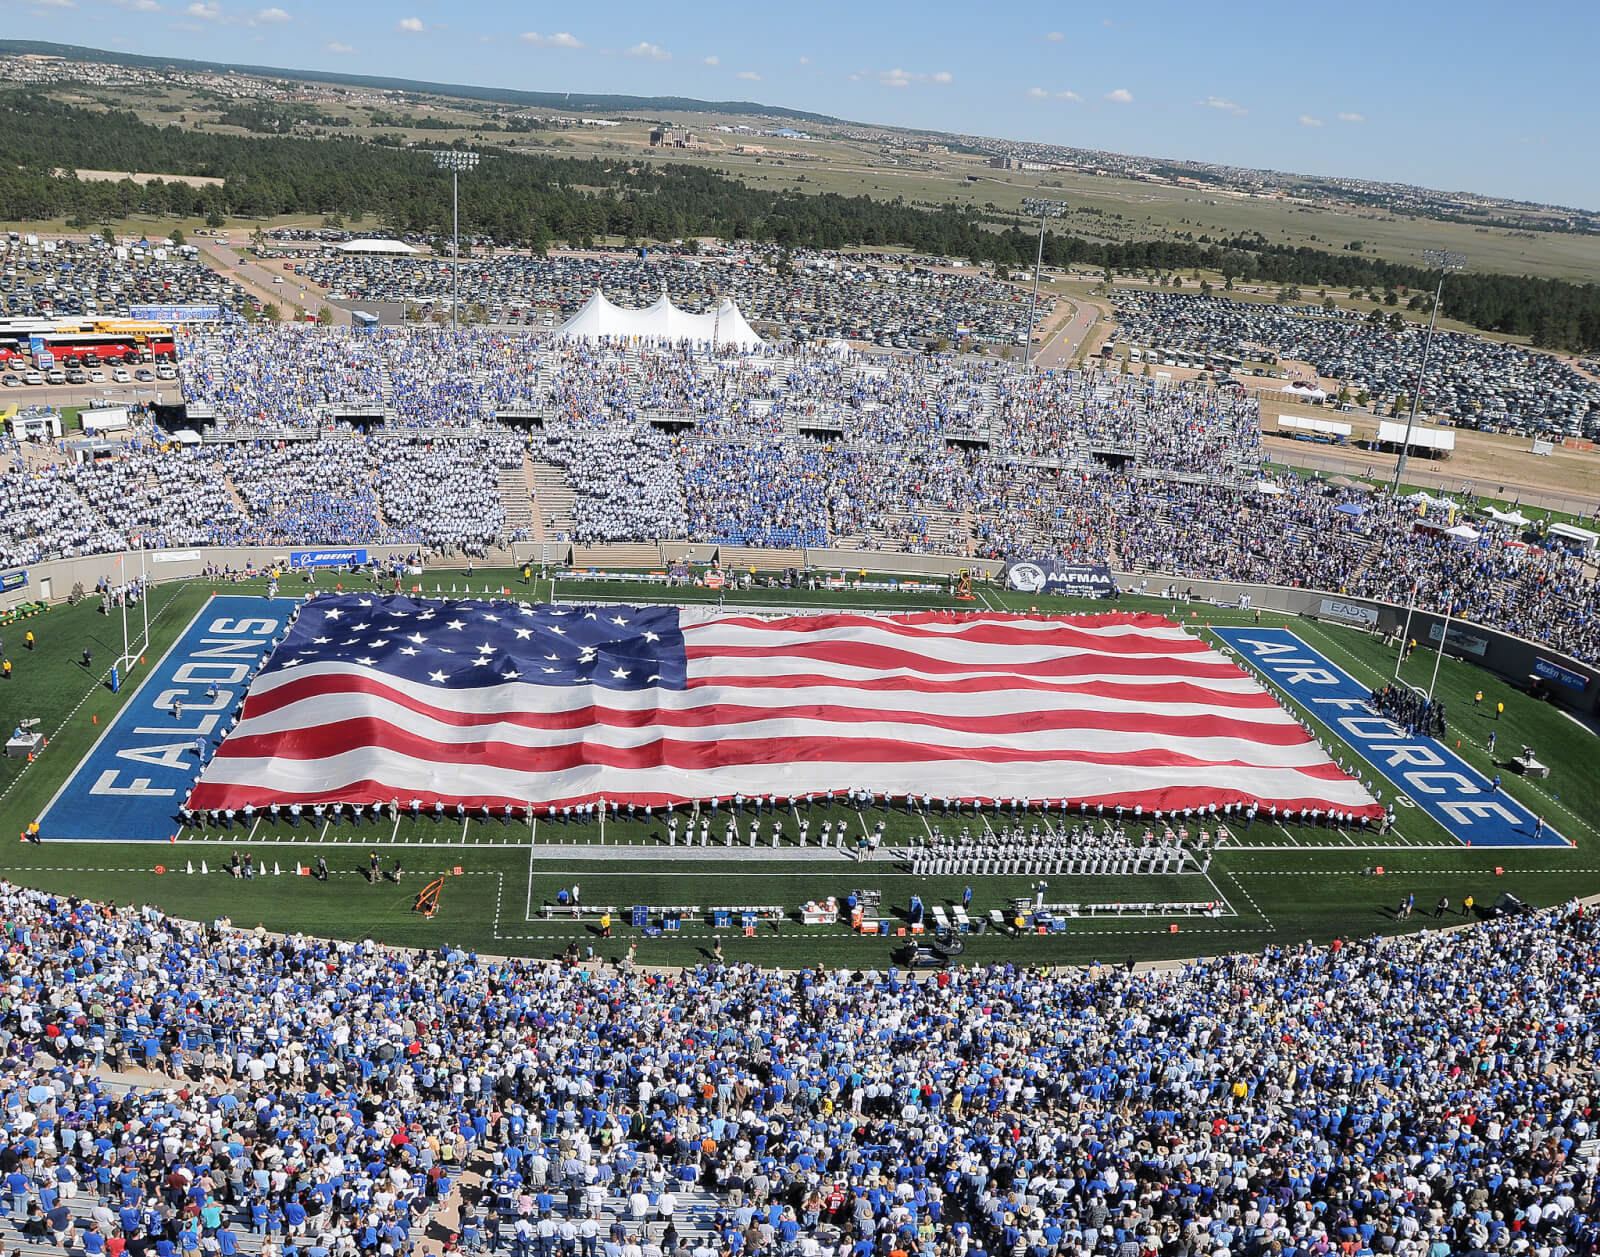 Air Force Academy stadium with flag on field